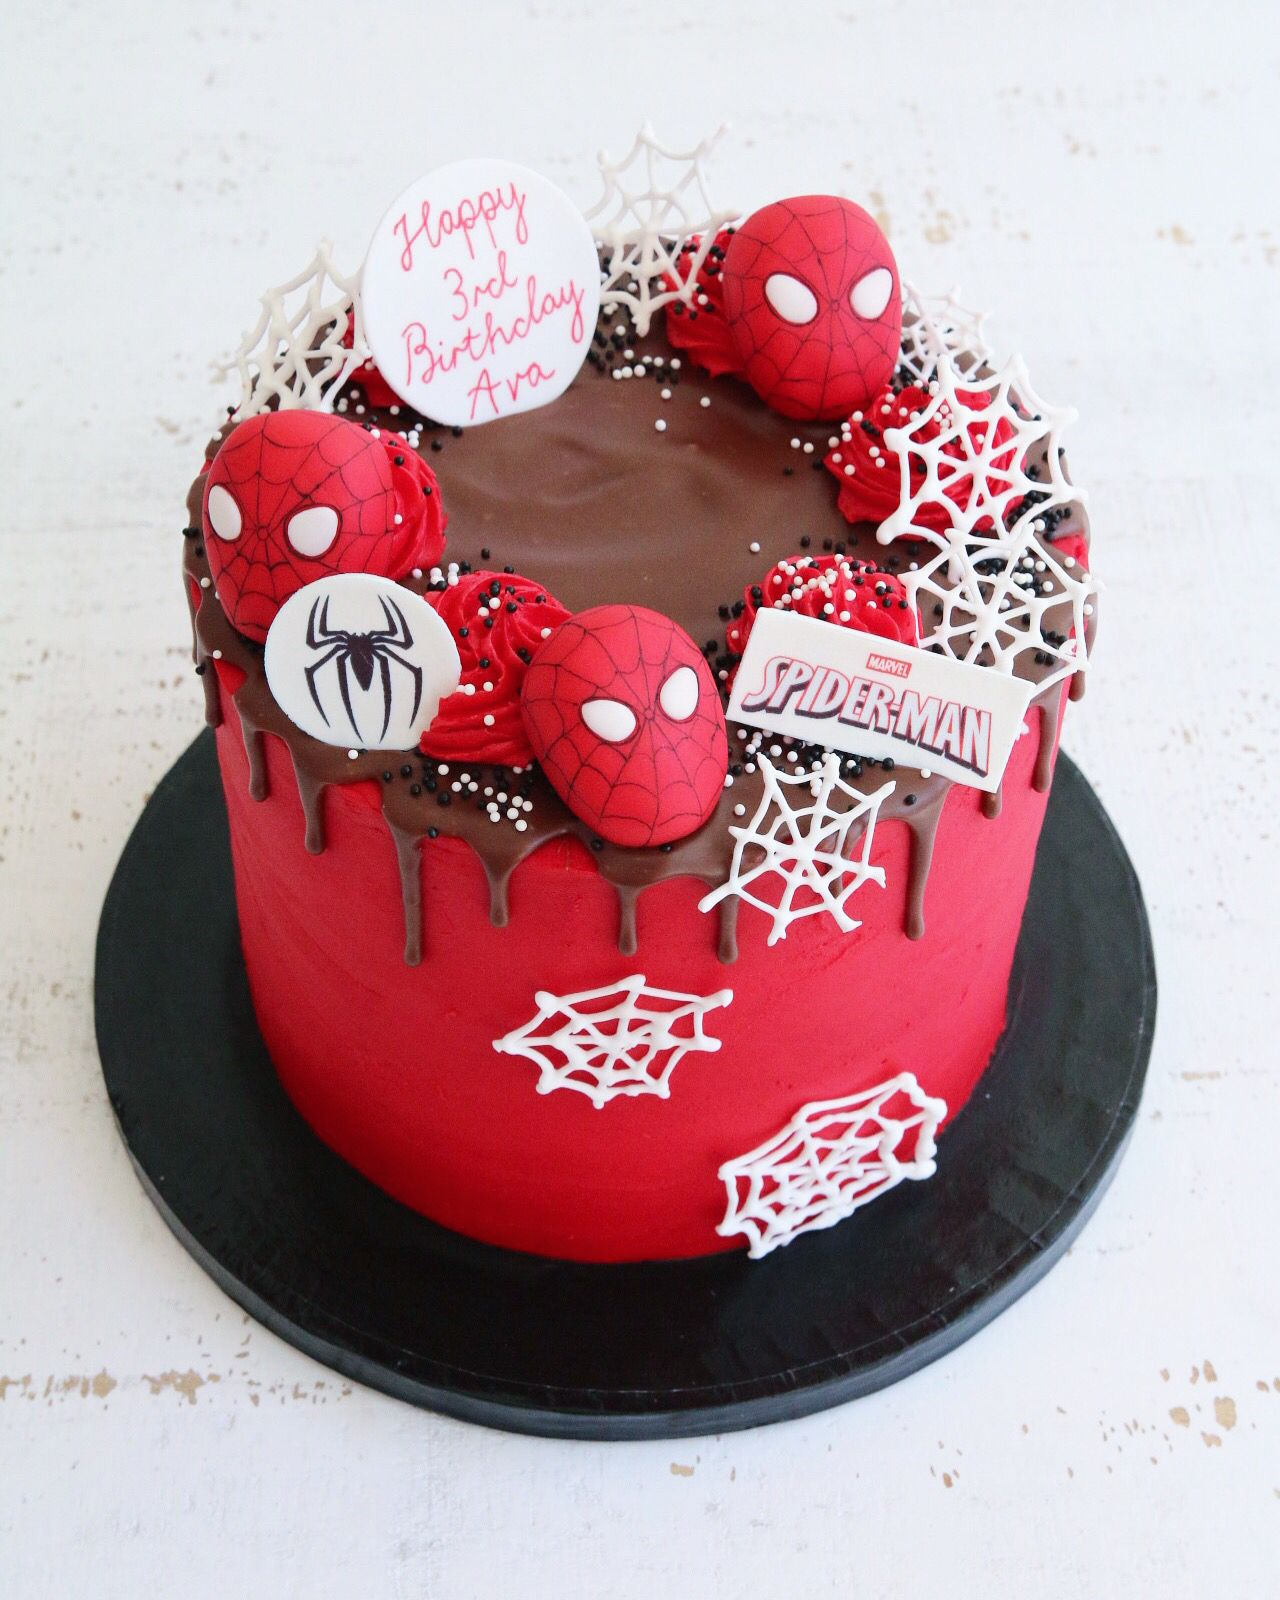 Superhero Cakes in 2020 Buttercream birthday cake